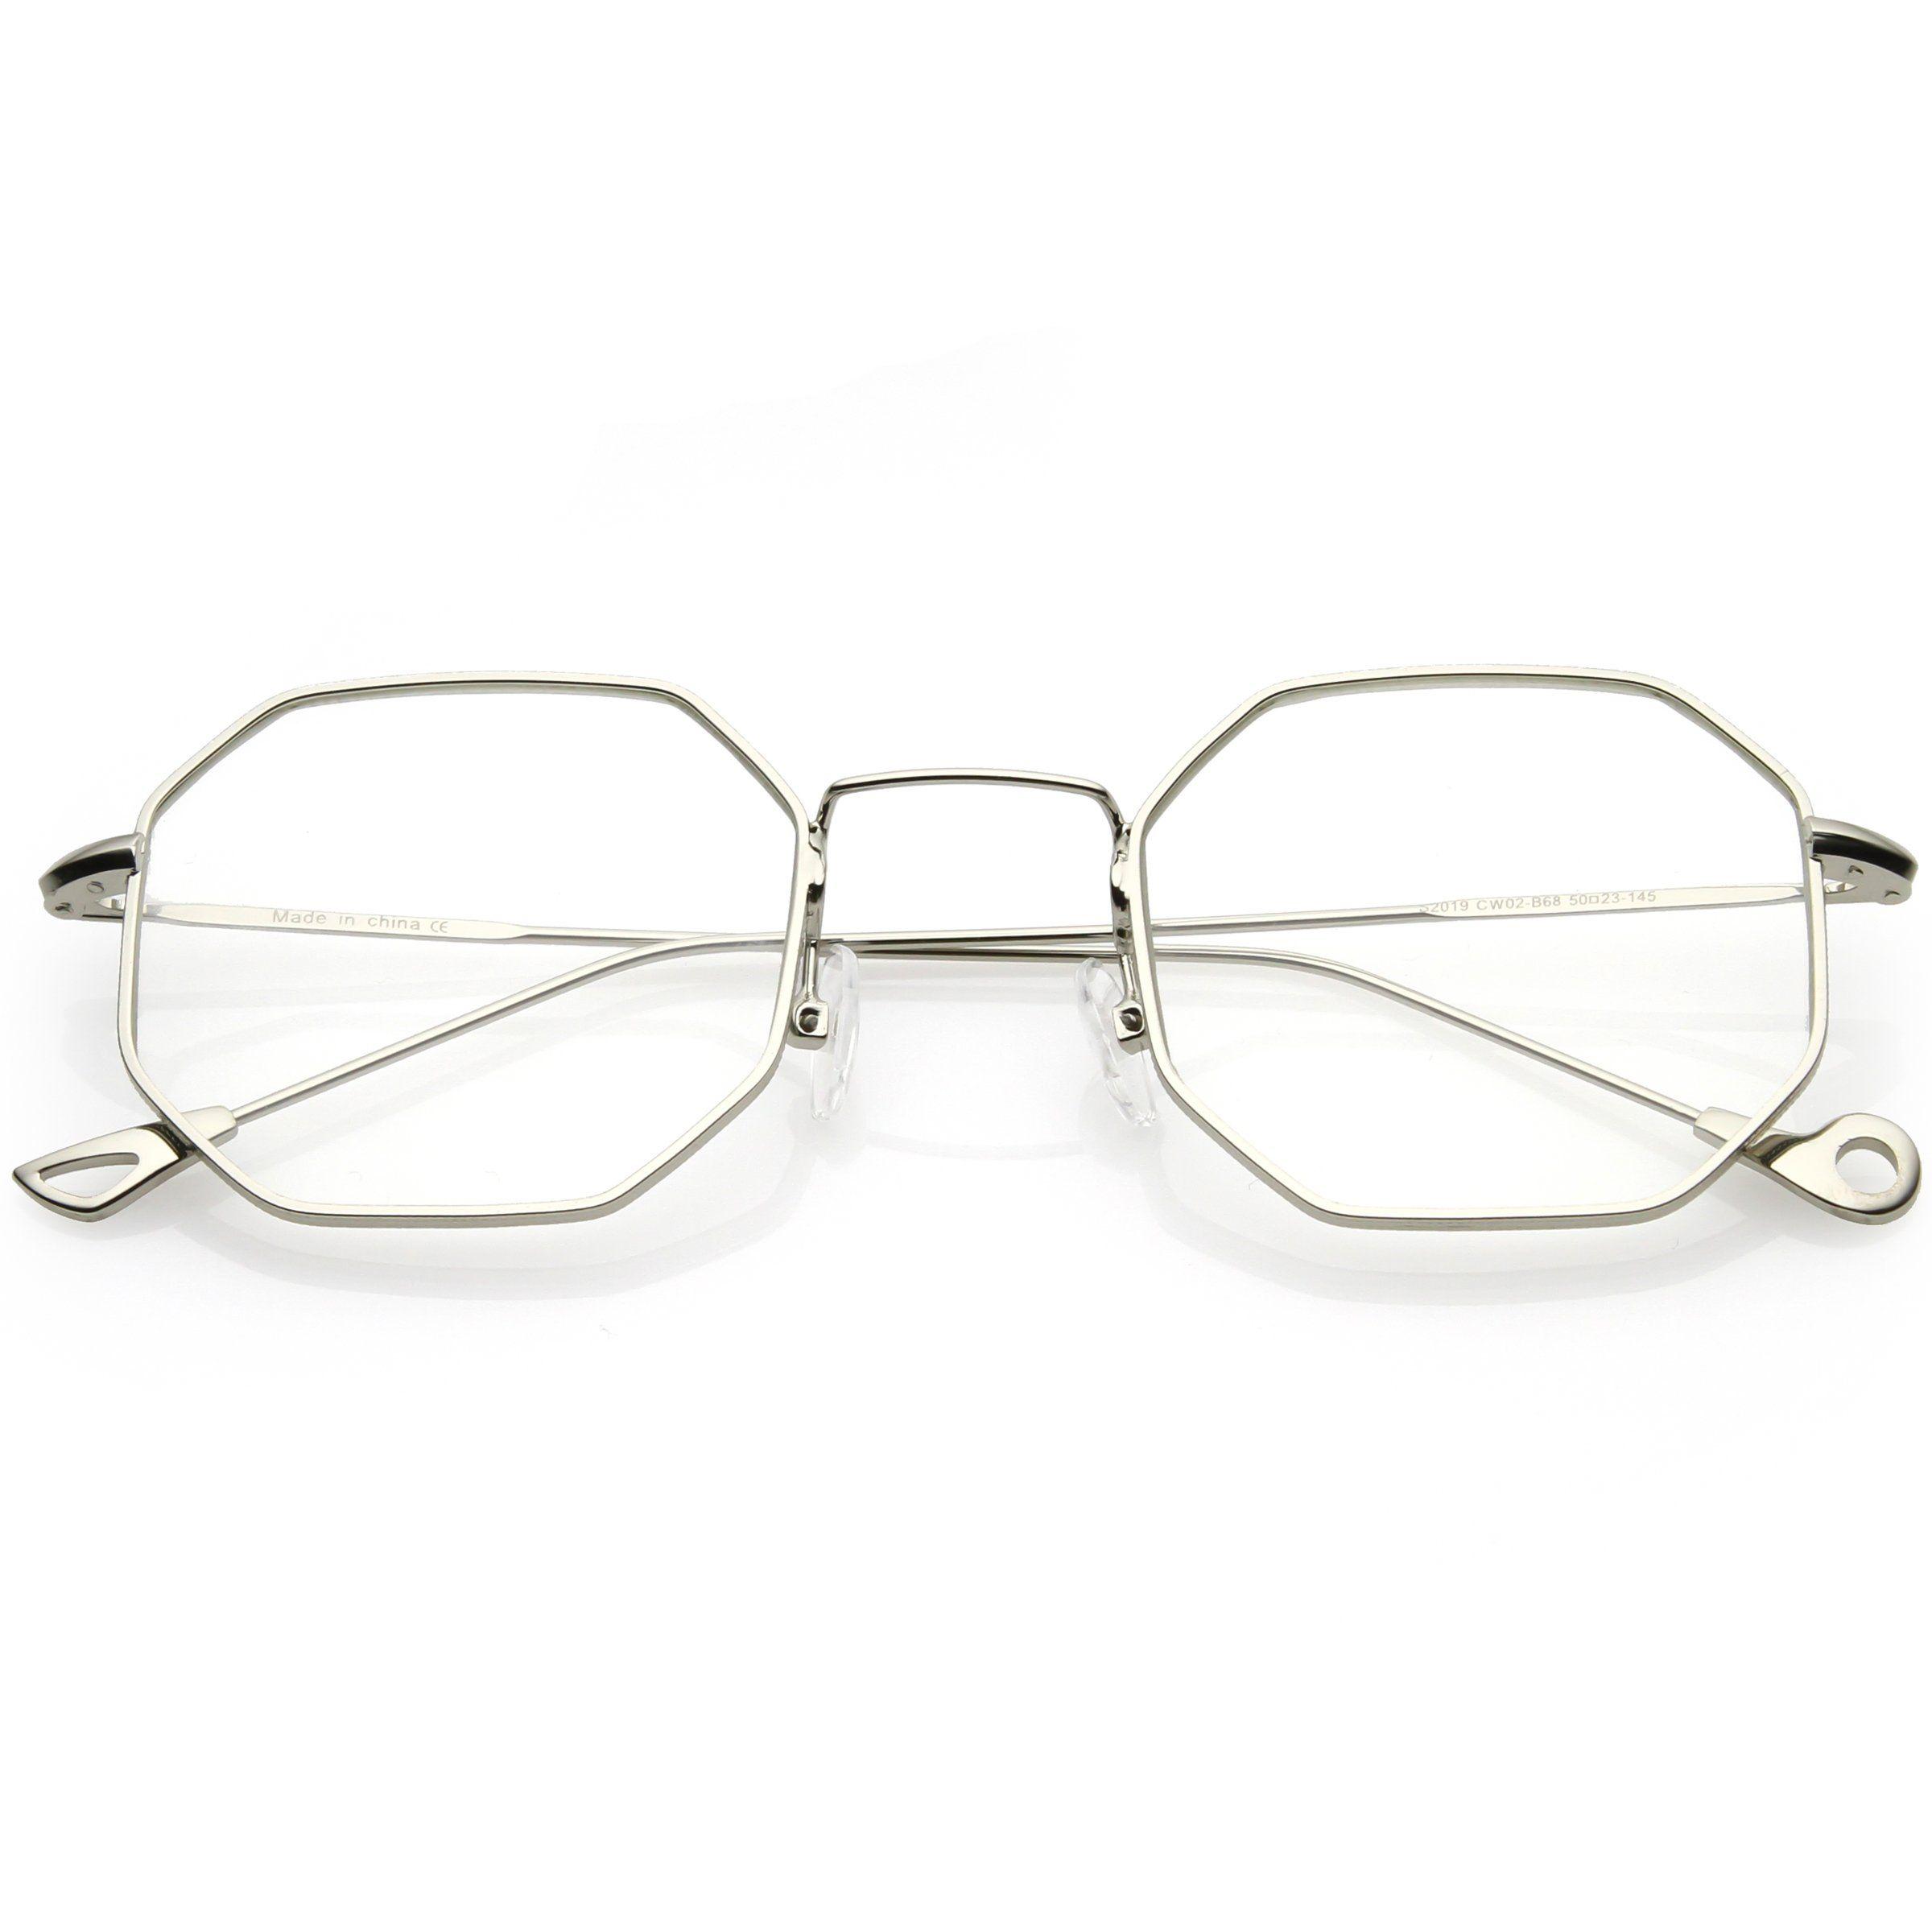 a11c7be3f2 Premium Retro Geometric Octagon Clear Lens Glasses C494